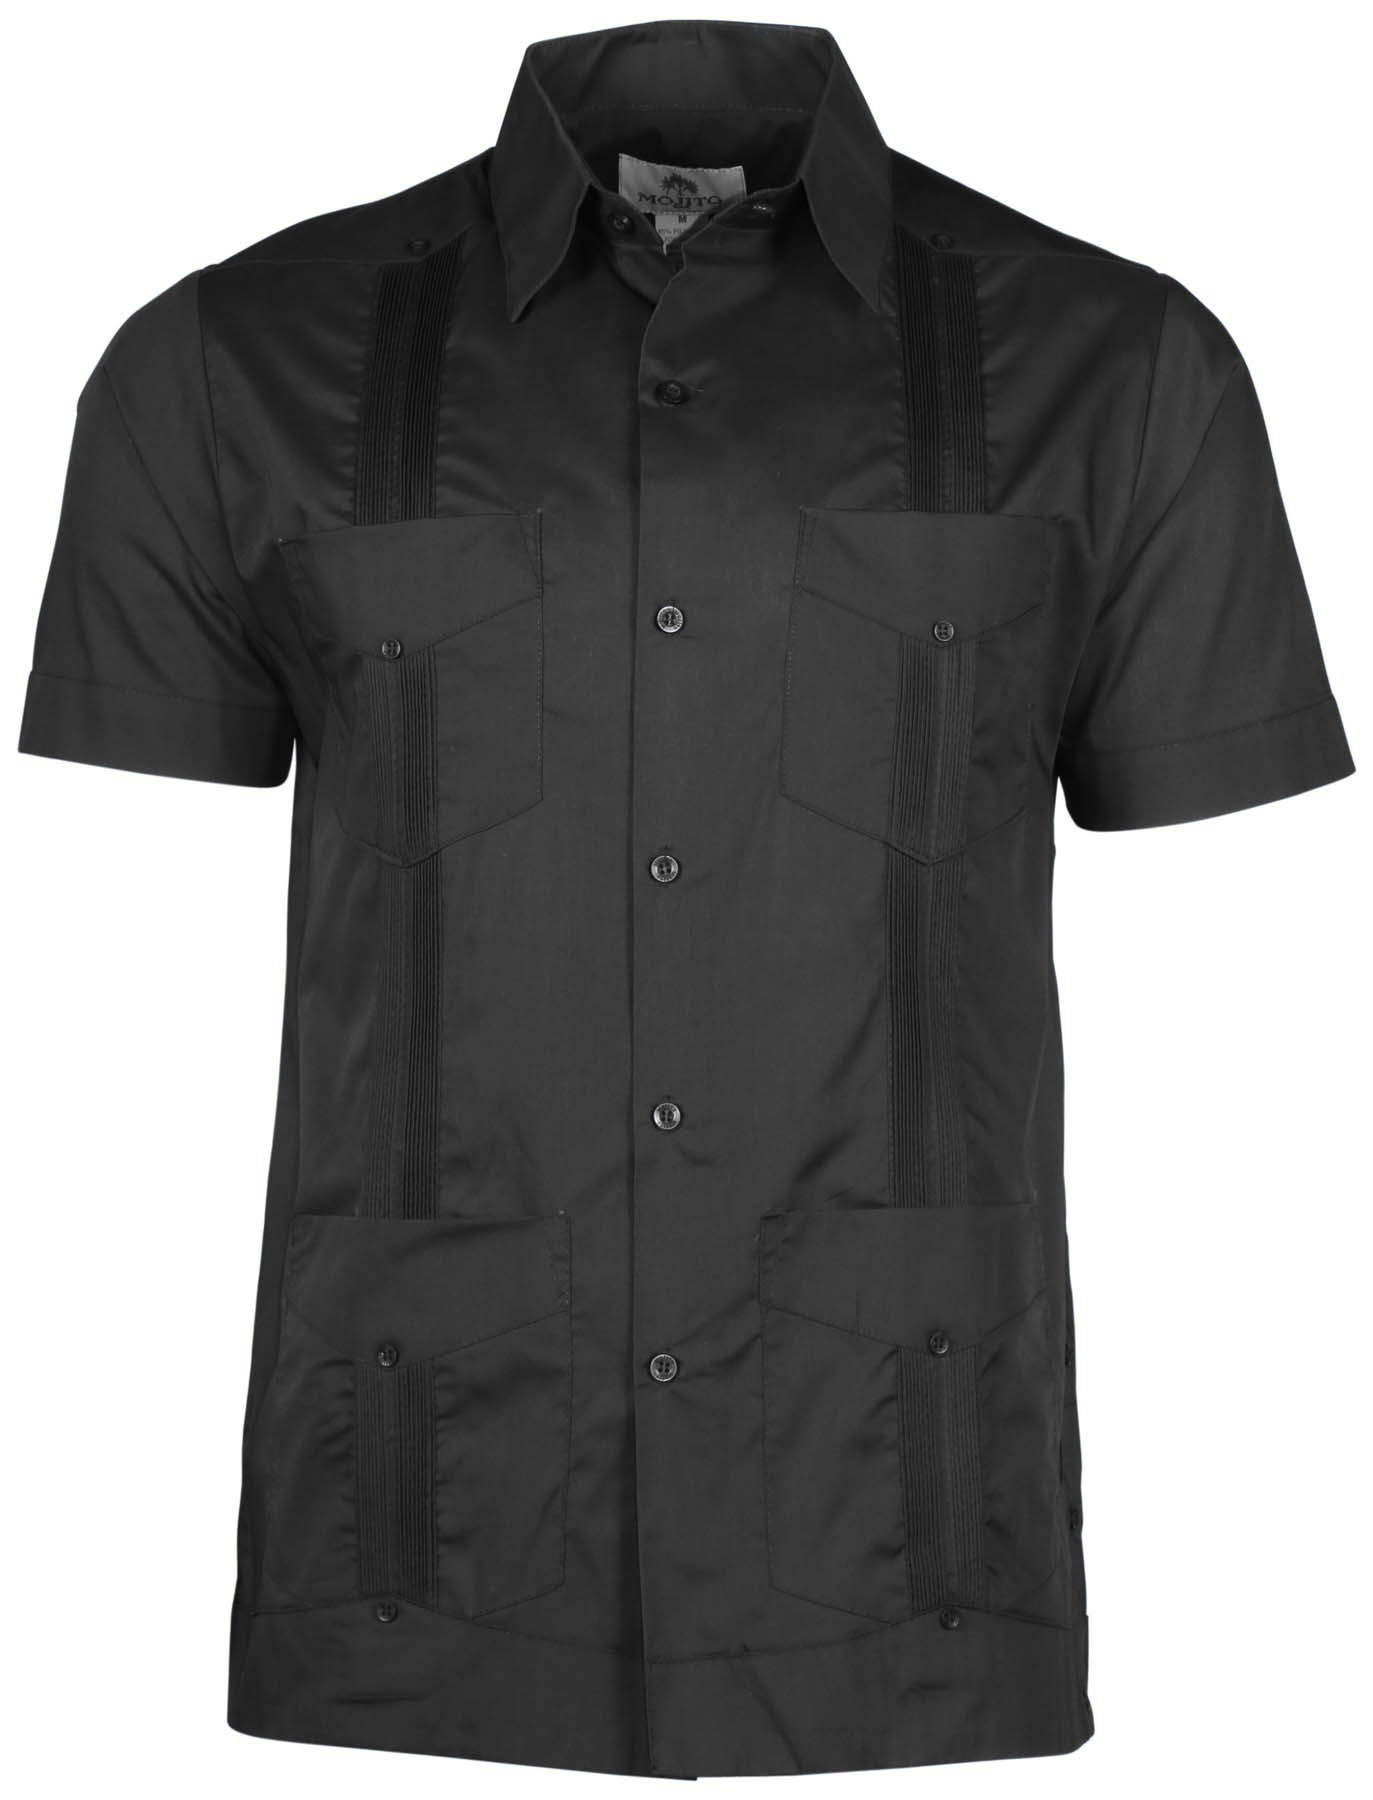 Mojito collection men 39 s big tall linen guayabera shirt for Men s big tall shirts